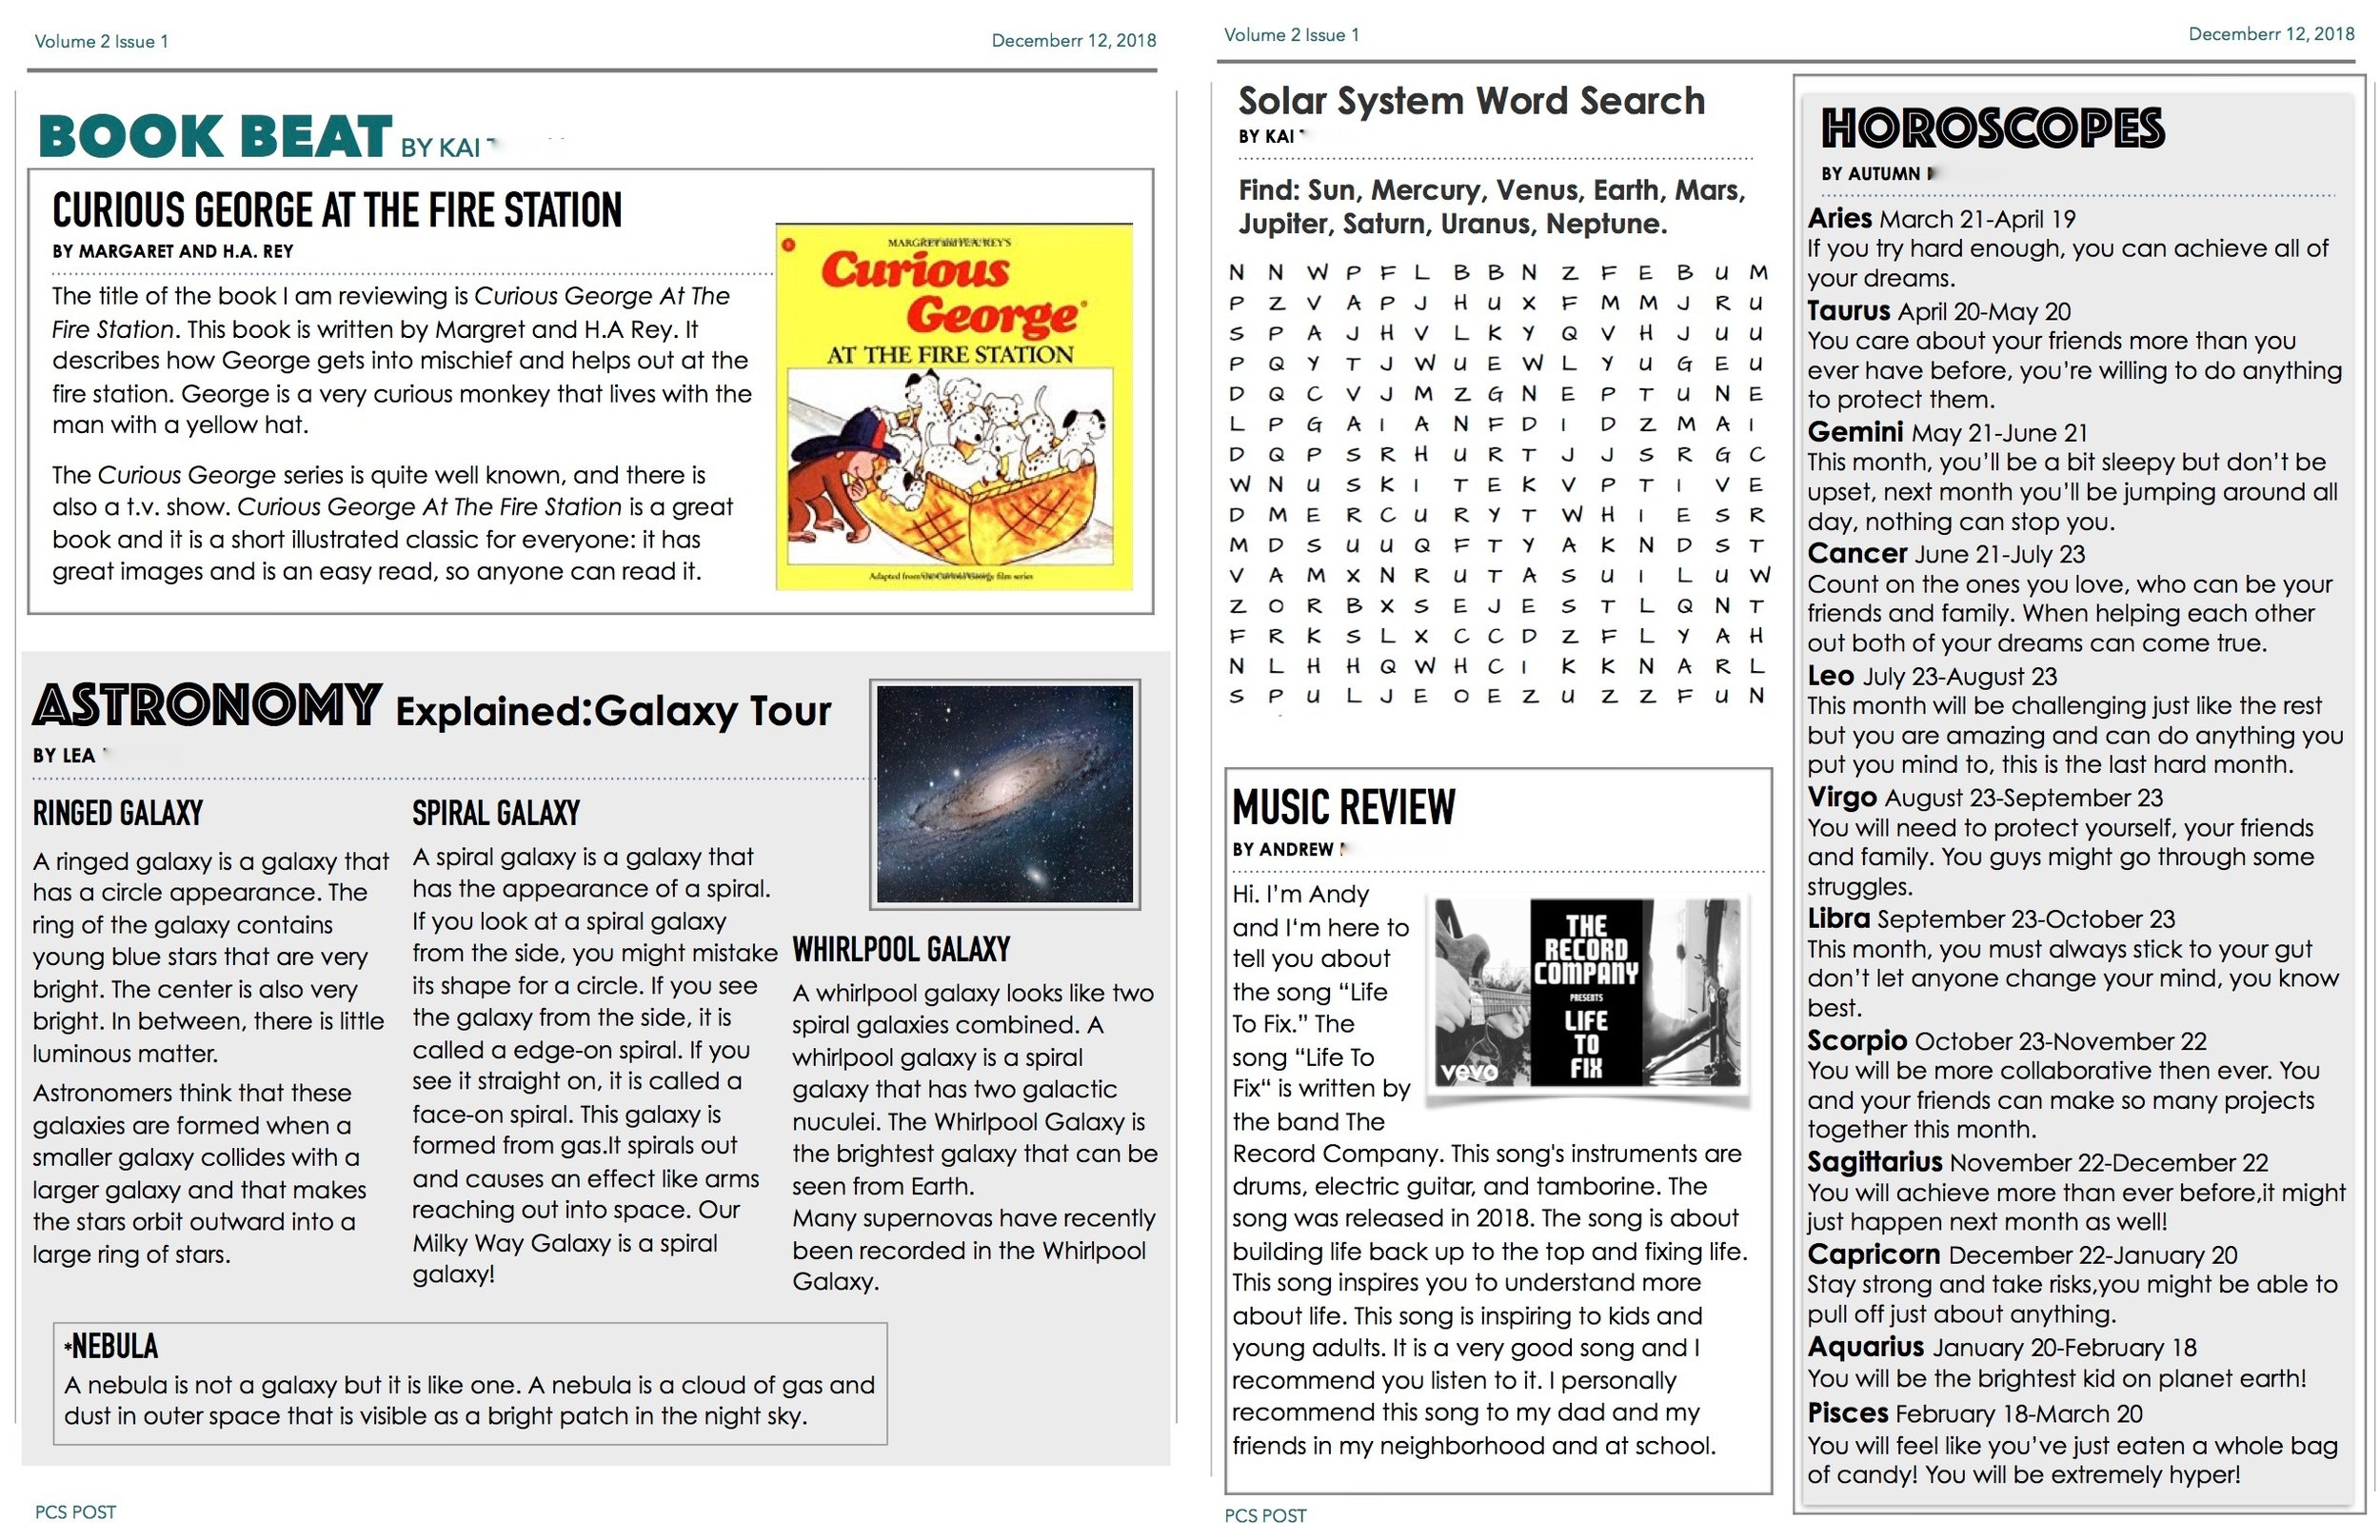 PCS POST vol 2 issue 1 pg 3 JPEG (1).jpg